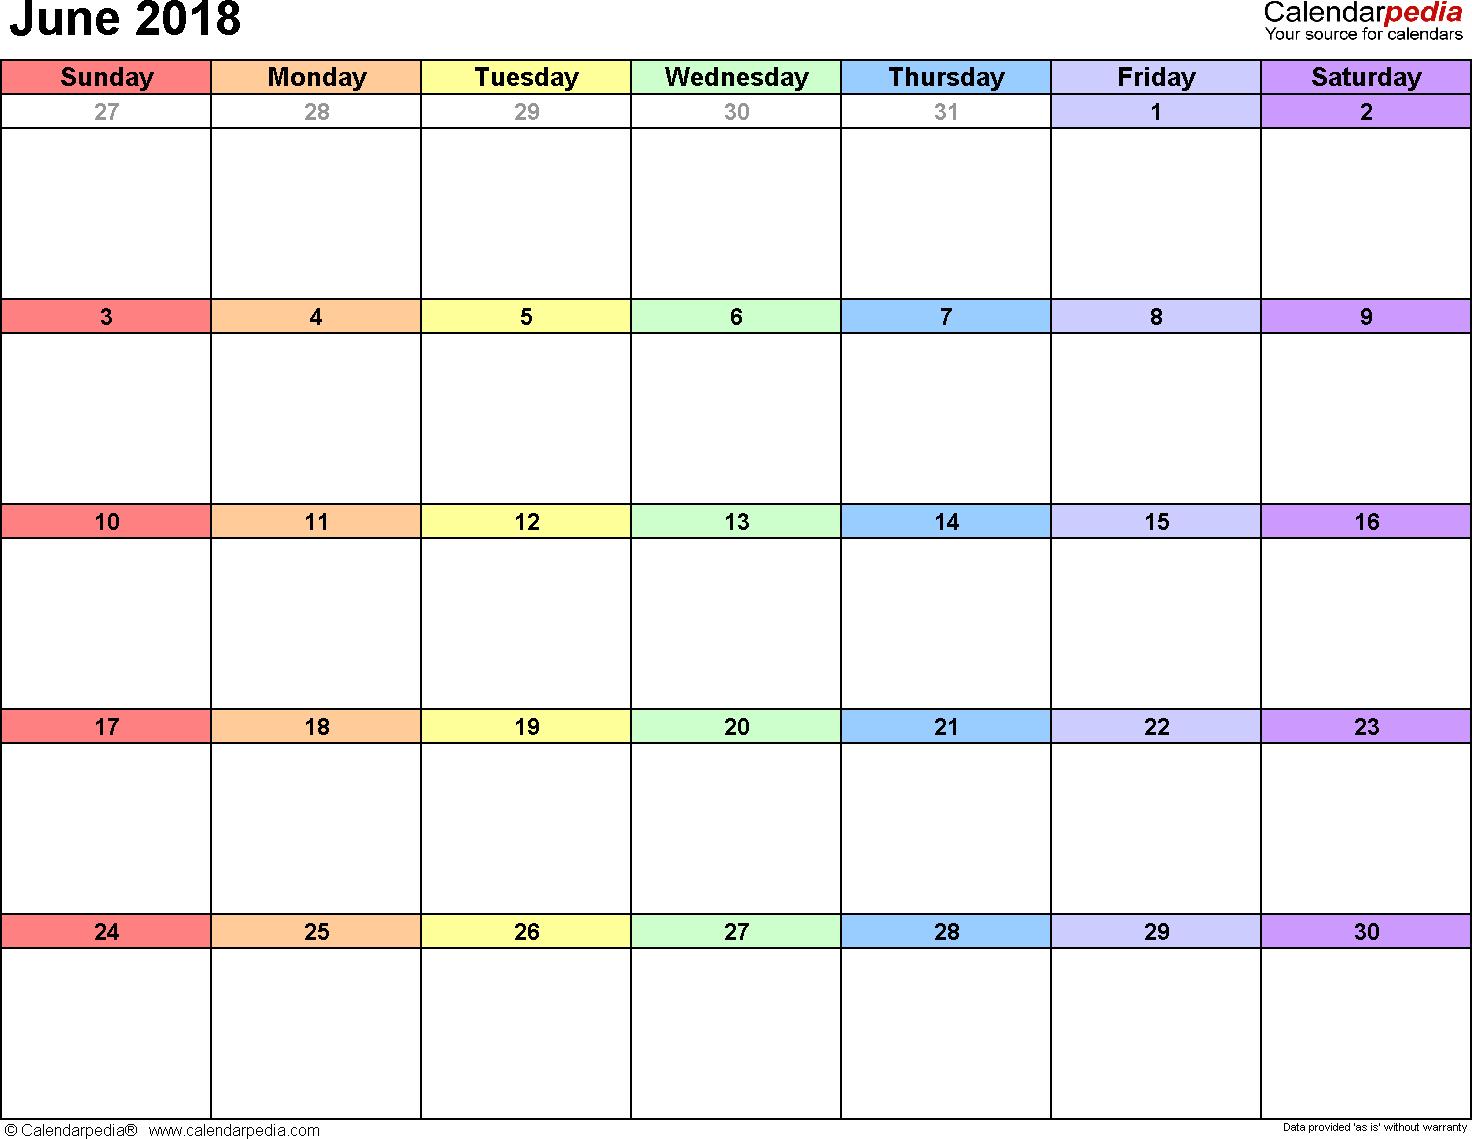 June 2018 Calendars For Word, Excel & Pdf regarding Calendar June Template Australia